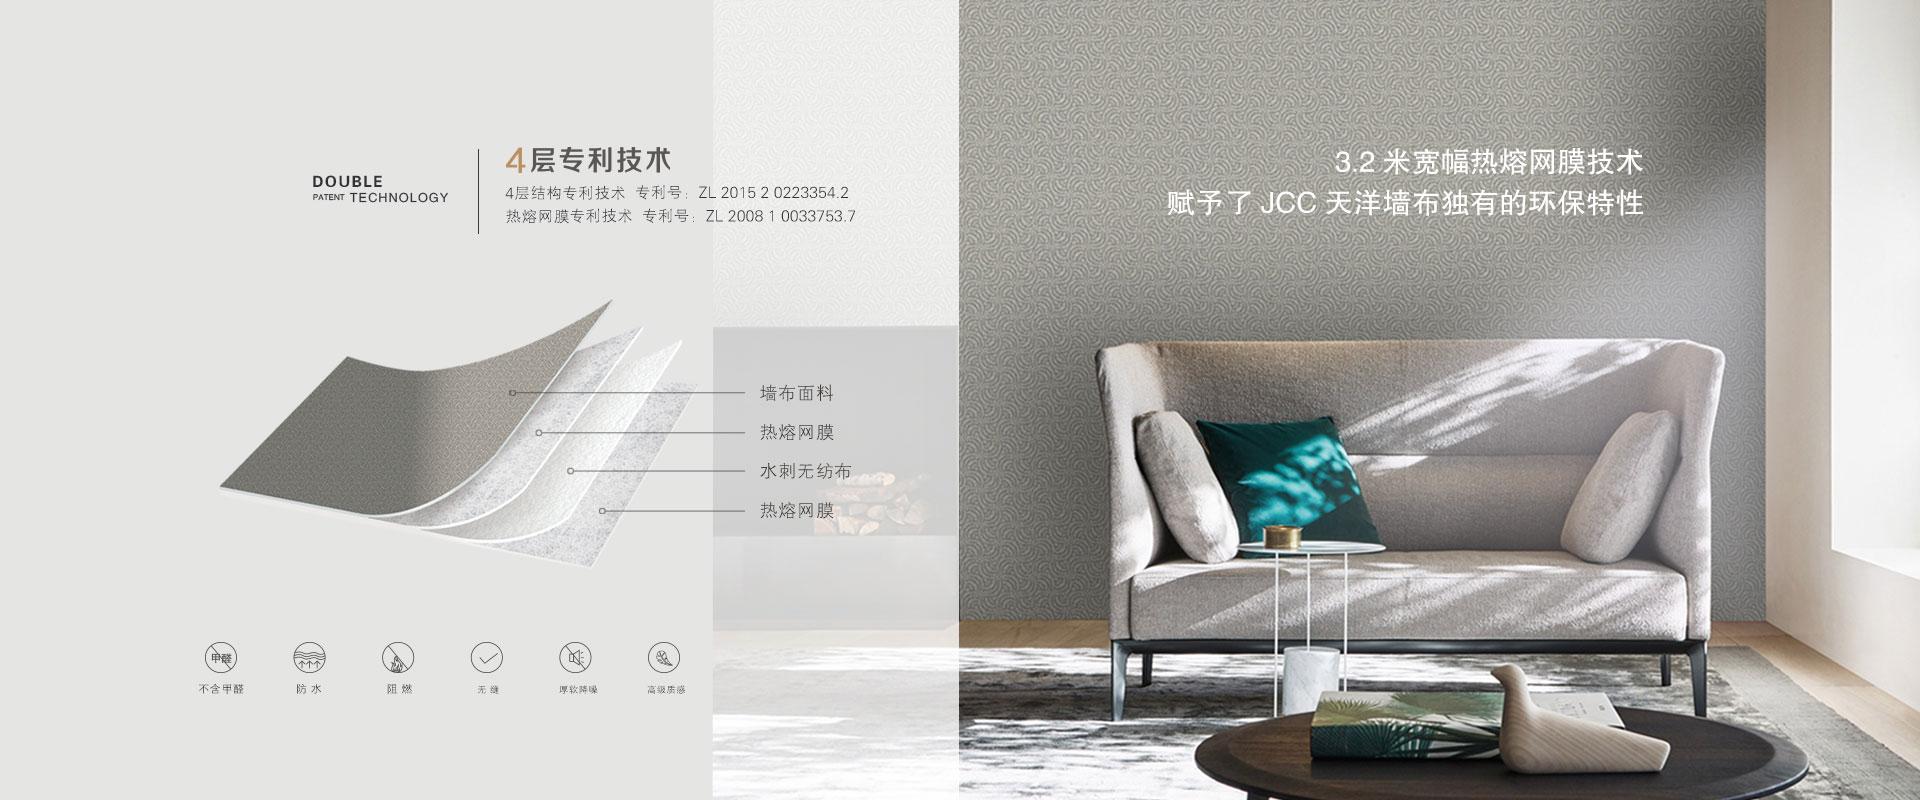 JCC天洋墙布四层结构专利